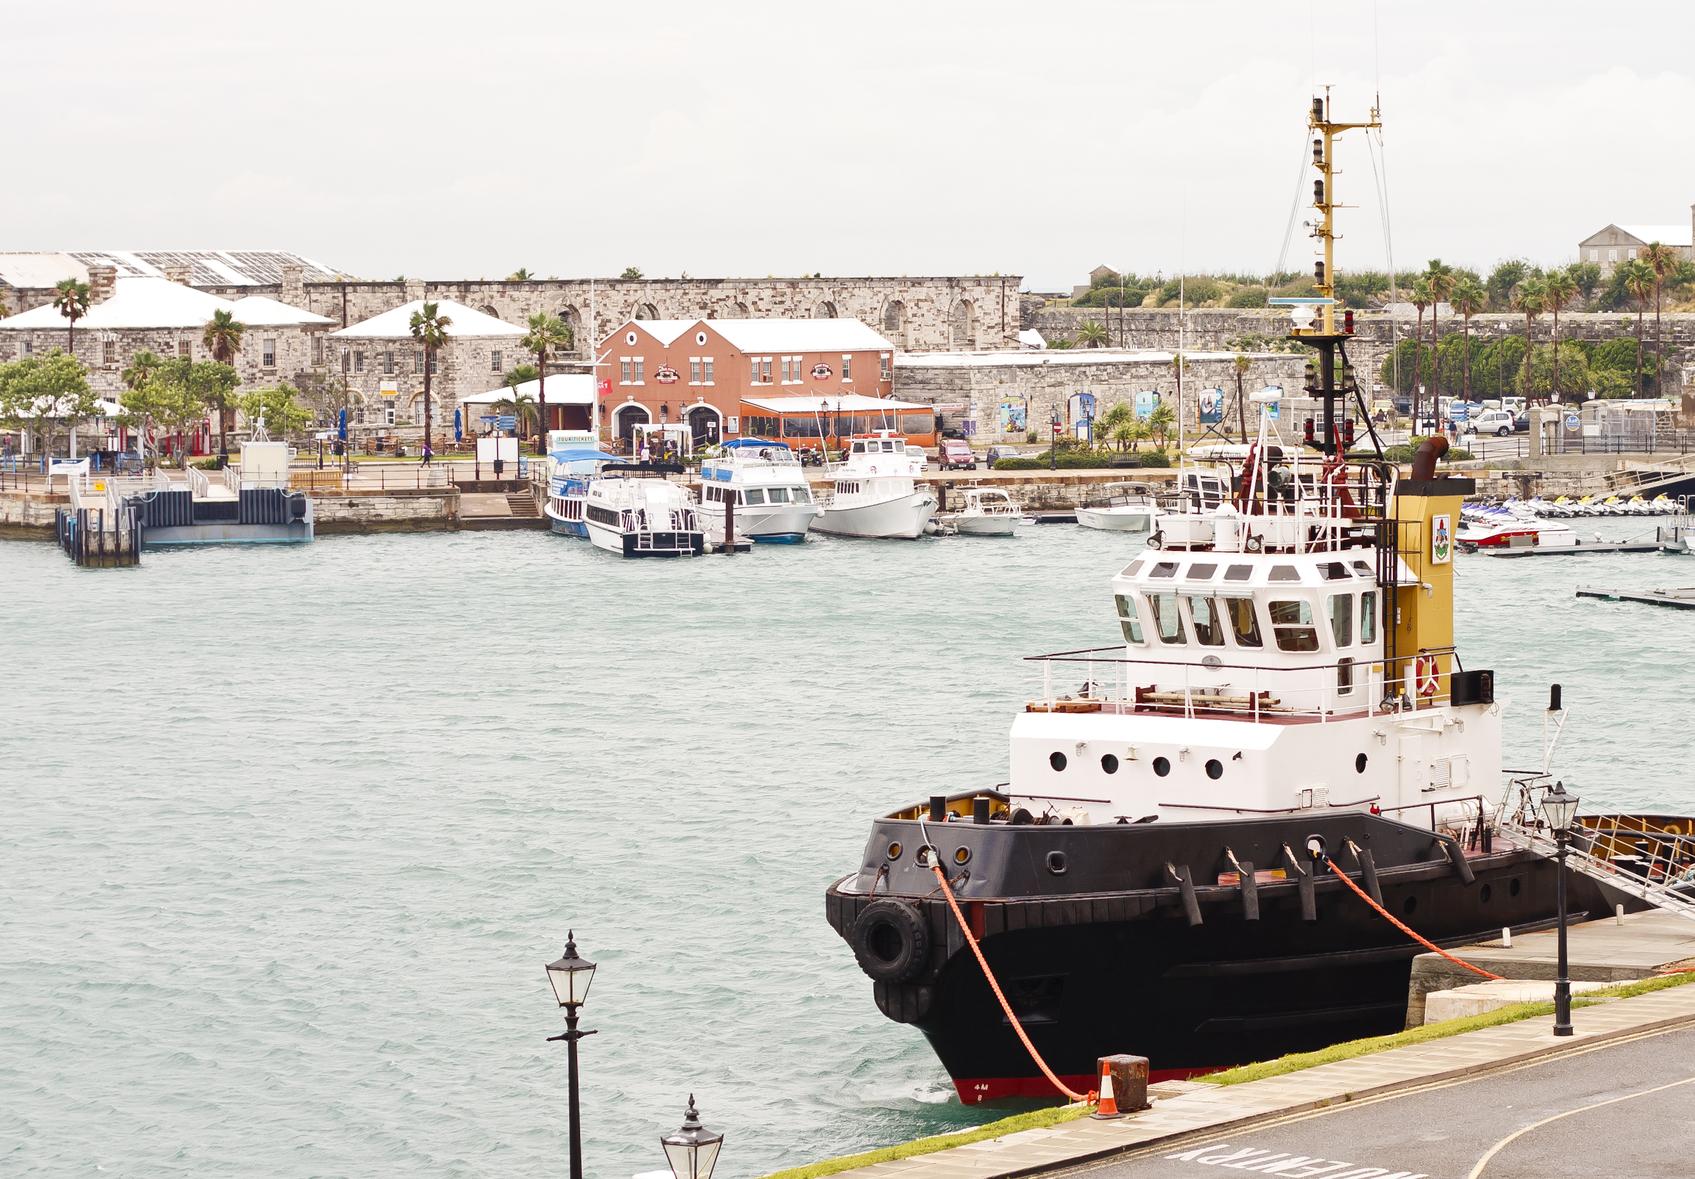 Bermuda cruise deals best cruises to bermuda - Tugboat At Harbor On Bermuda